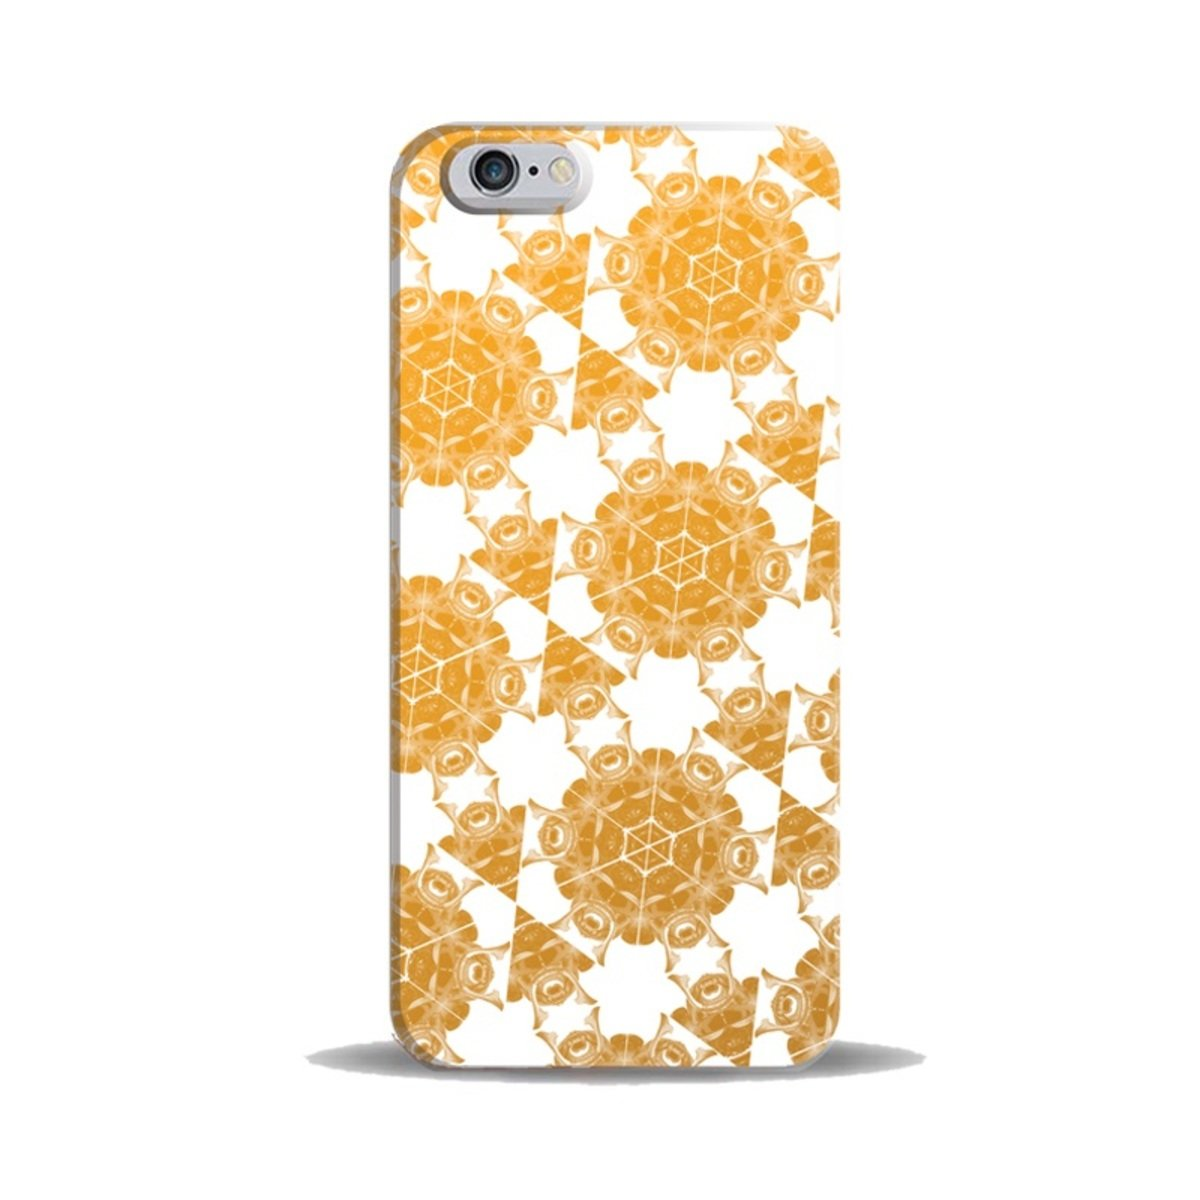 "iPhase - iPhone 6 (4.7"") 手機膠殼電話保護套 4.7寸 (Samural) (另有適合iPhone 6 Plus 5.5寸型號)"